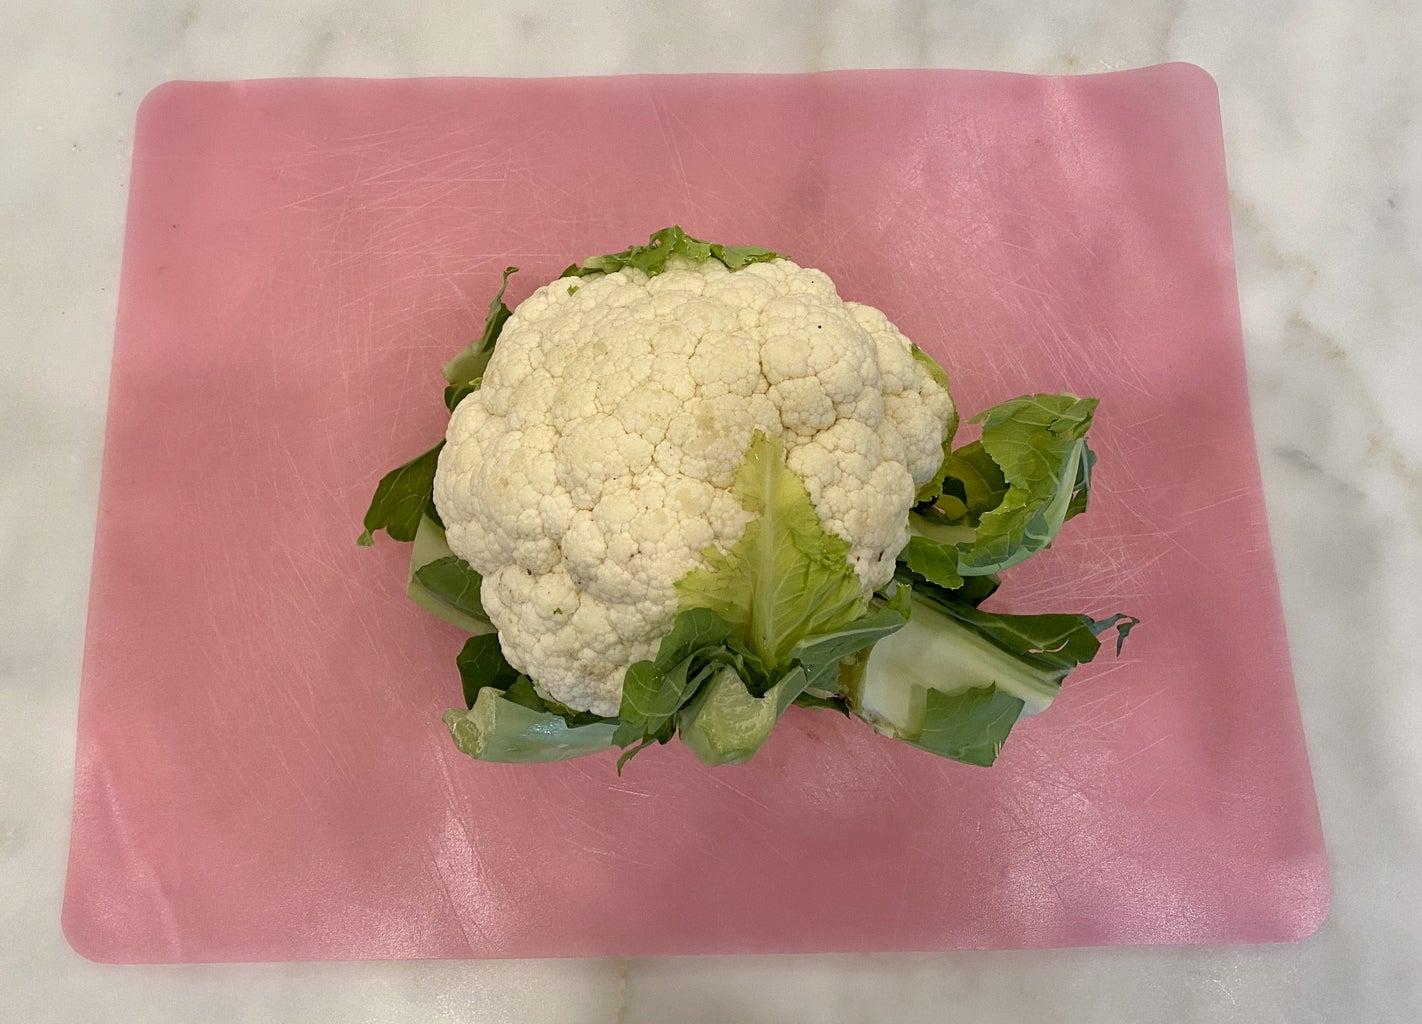 Cauliflower Steaks and Israeli Couscous